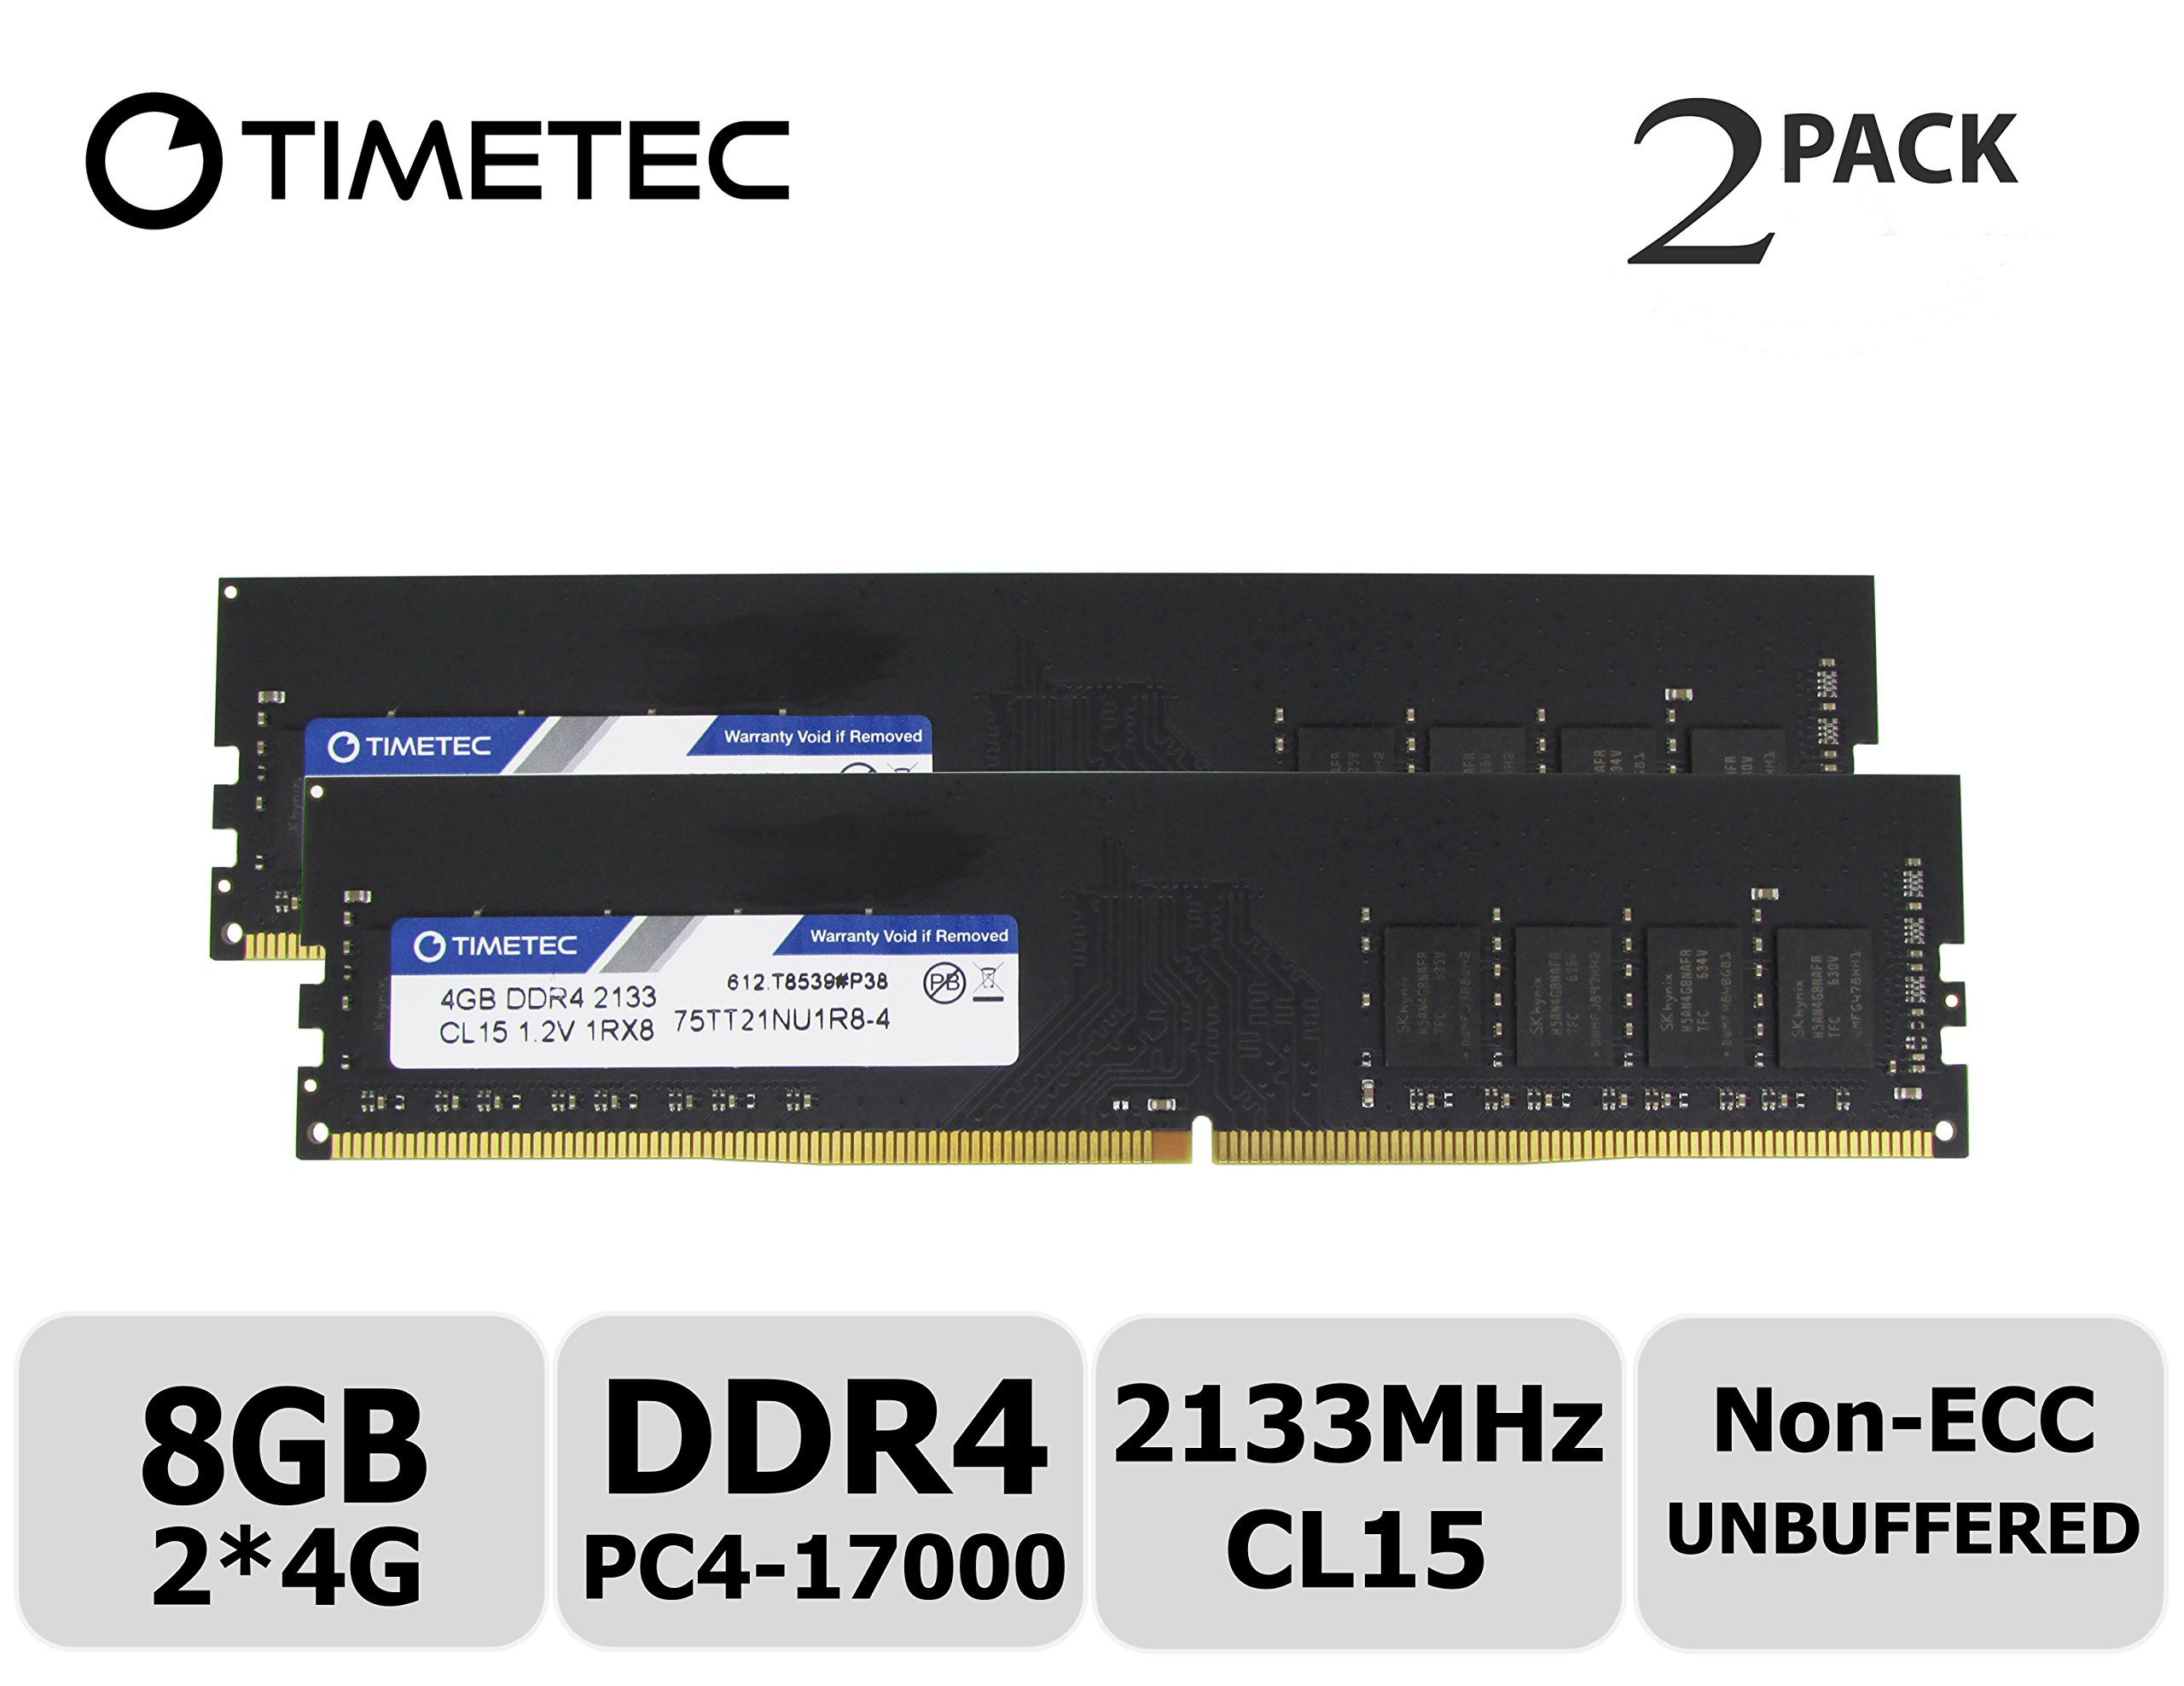 Memoria RAM 8GB Timetec Hynix IC Kit (2x4GB) DDR4 2133MHz PC4-17000 Non ECC Unbuffered 1.2V CL15 1R8 Single Rank 288 Pin